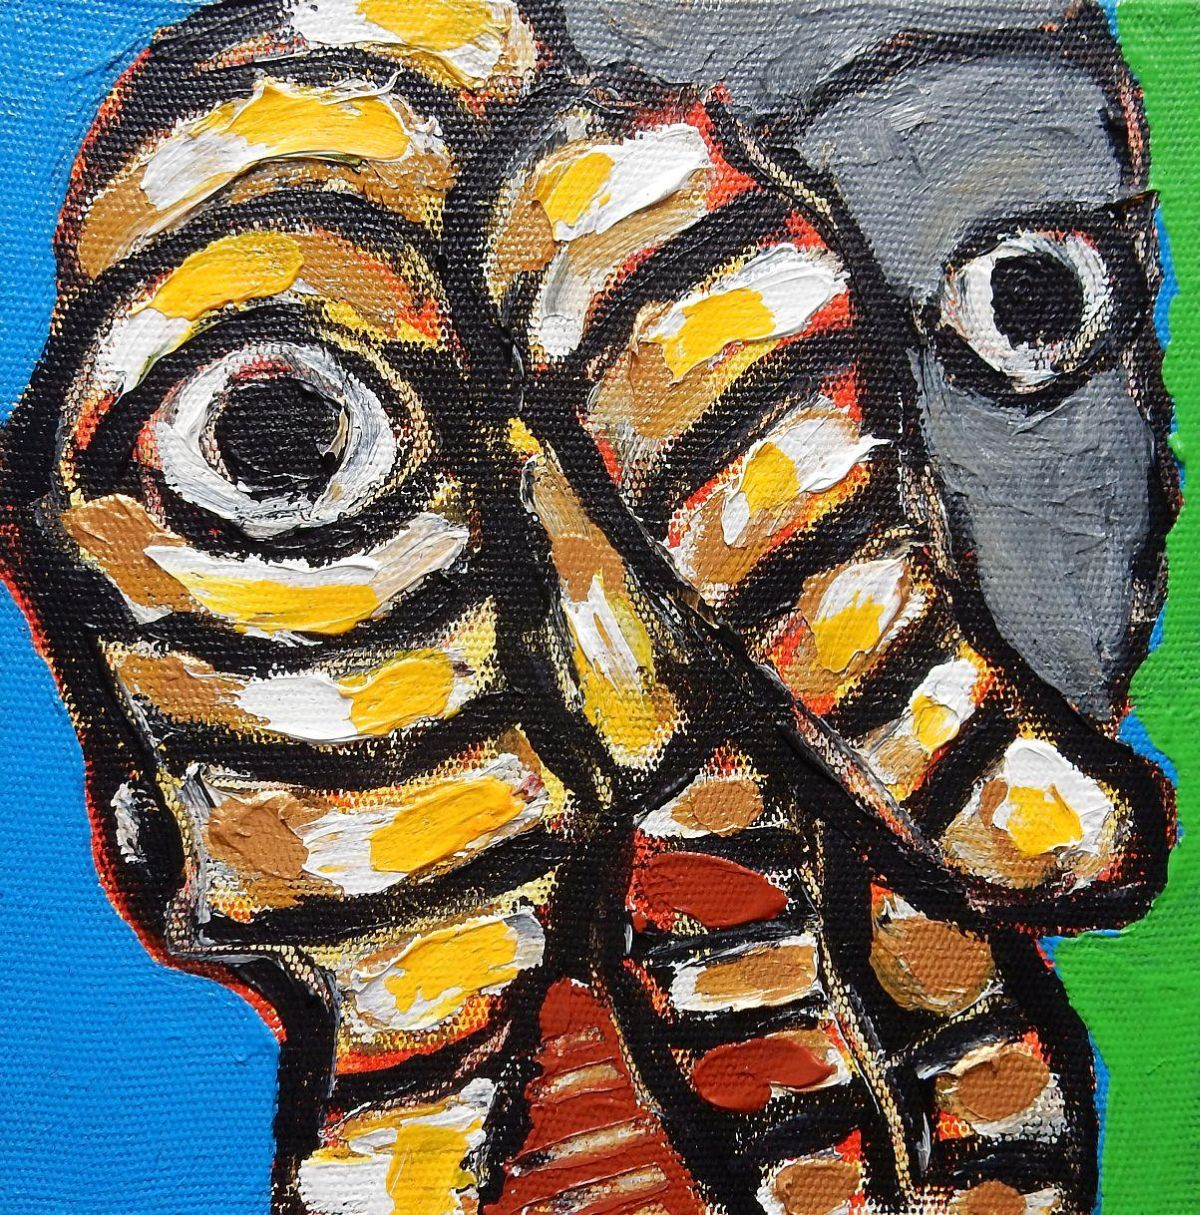 Jorge Castilla-Bambaren - Wesen, Acrylbild, 20x20 cm, Unikat, verso signiert 2005 kopen? Bied vanaf 290!